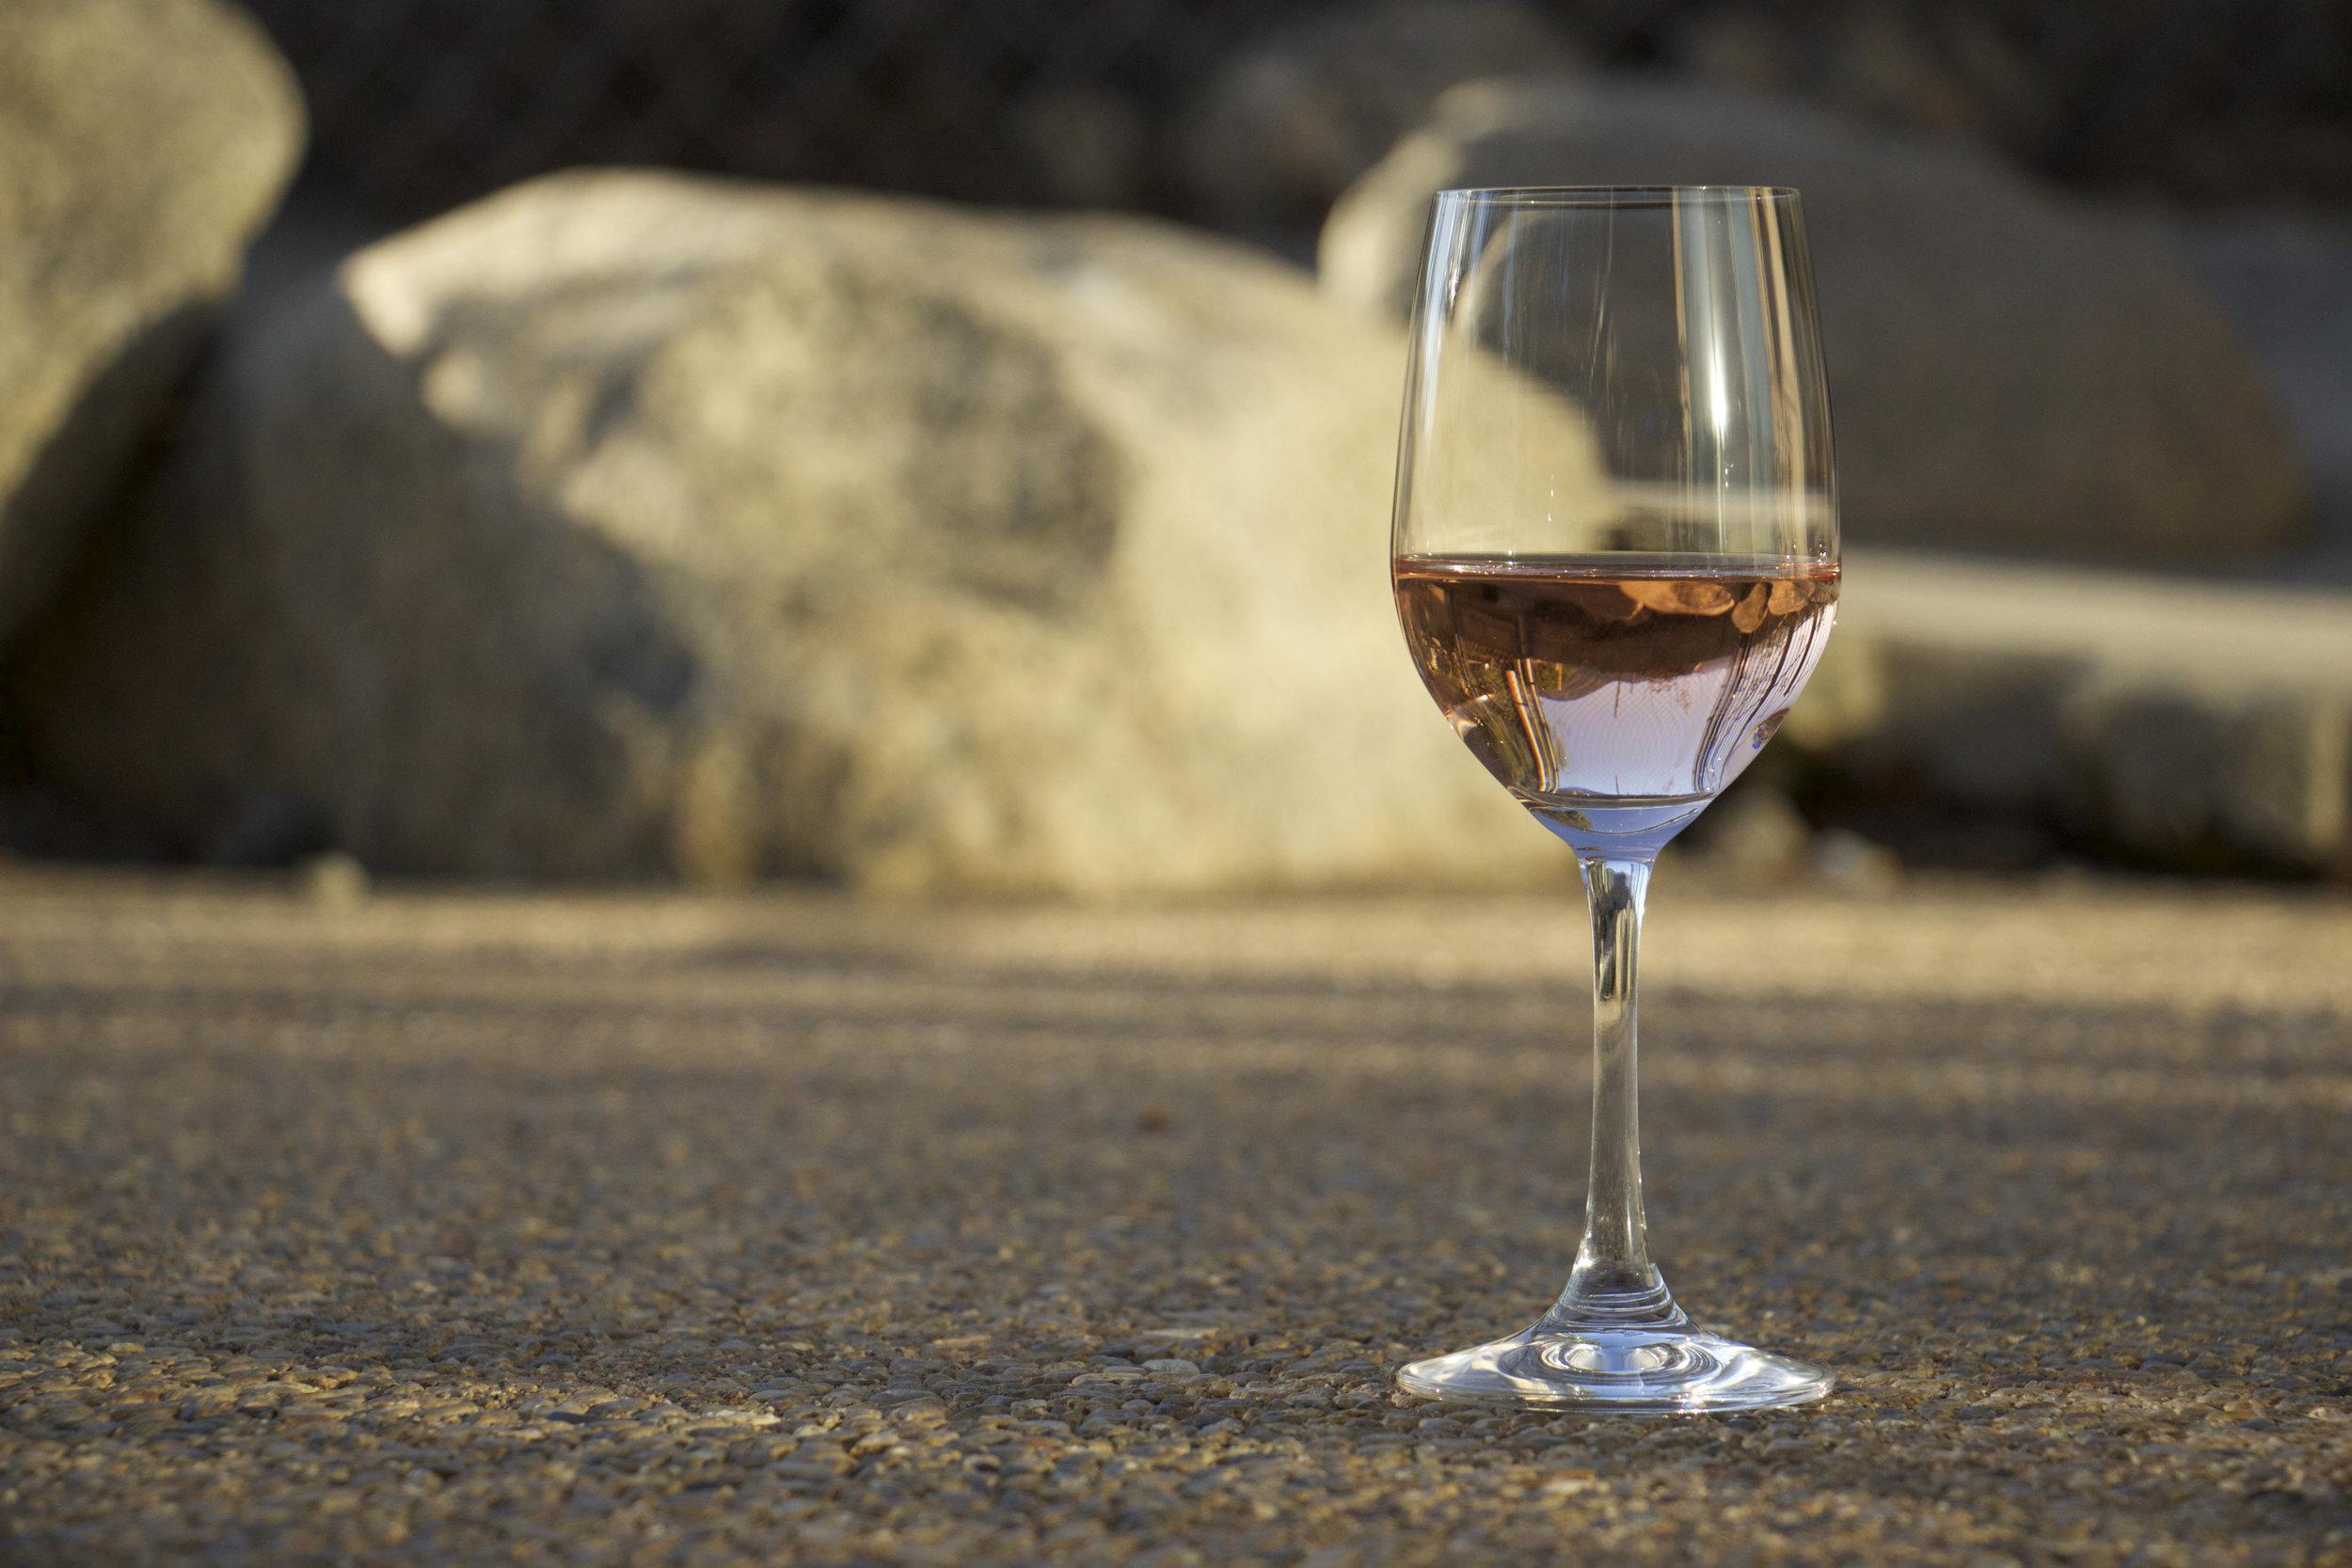 limited release dark horse rose trader joe's wine best